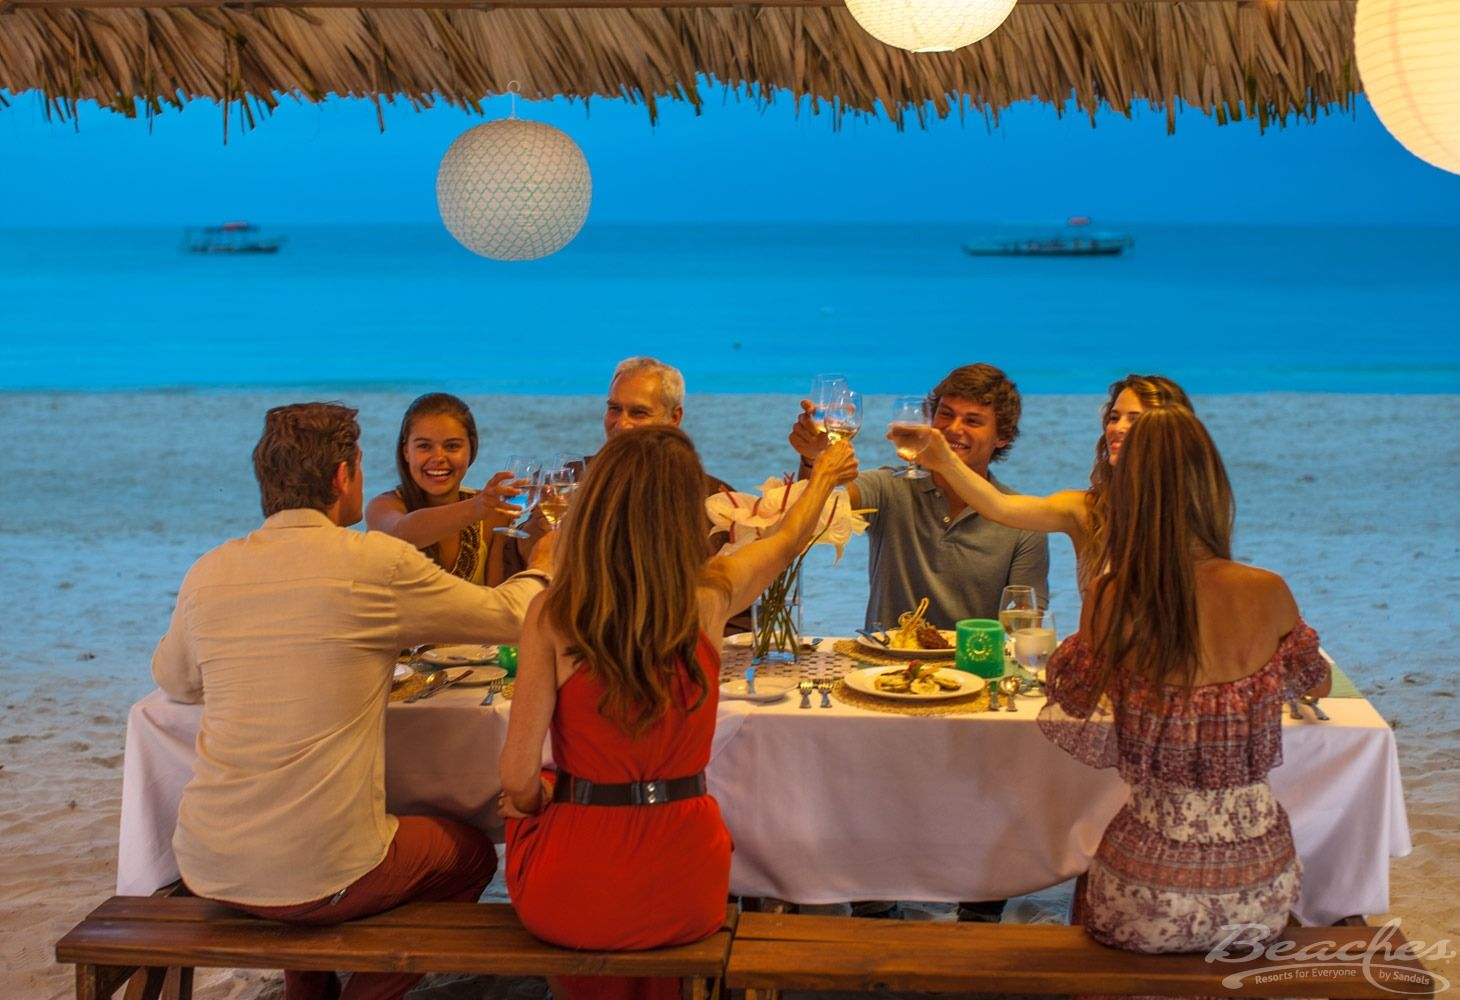 Beaches-Negril-Beach-Restaurant-Dining